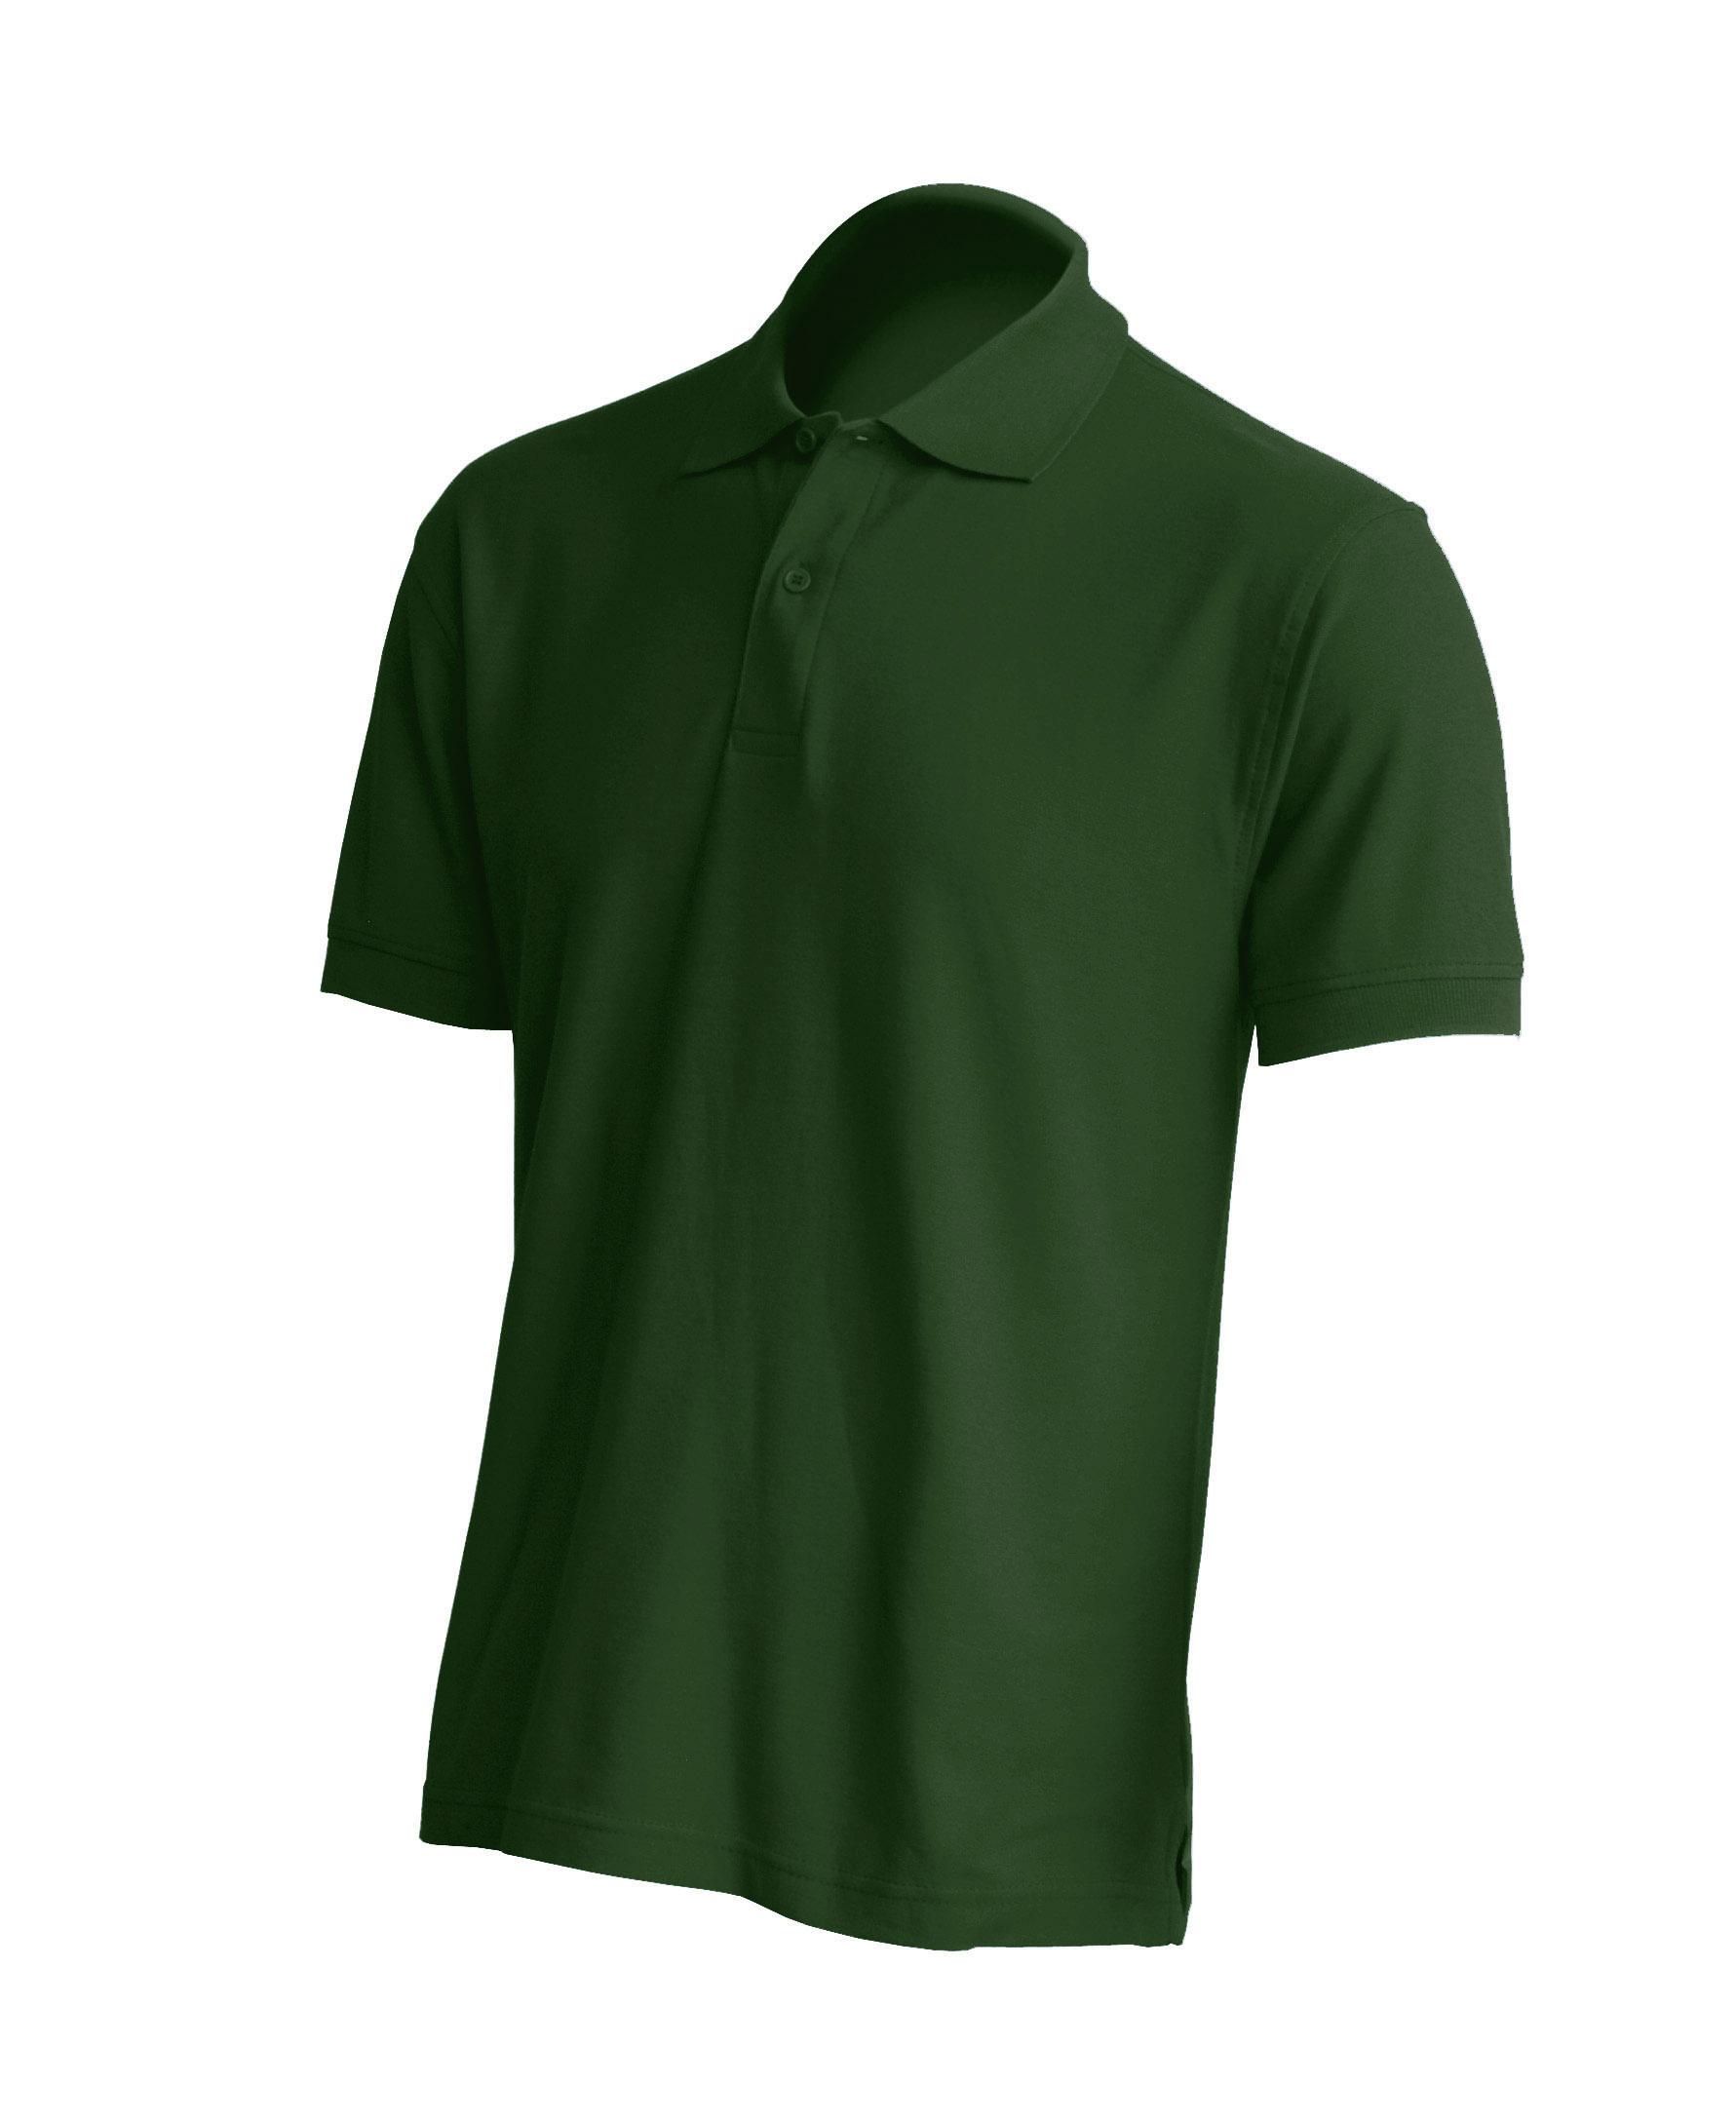 Muška polo majica kratkih rukava, bottle zelena